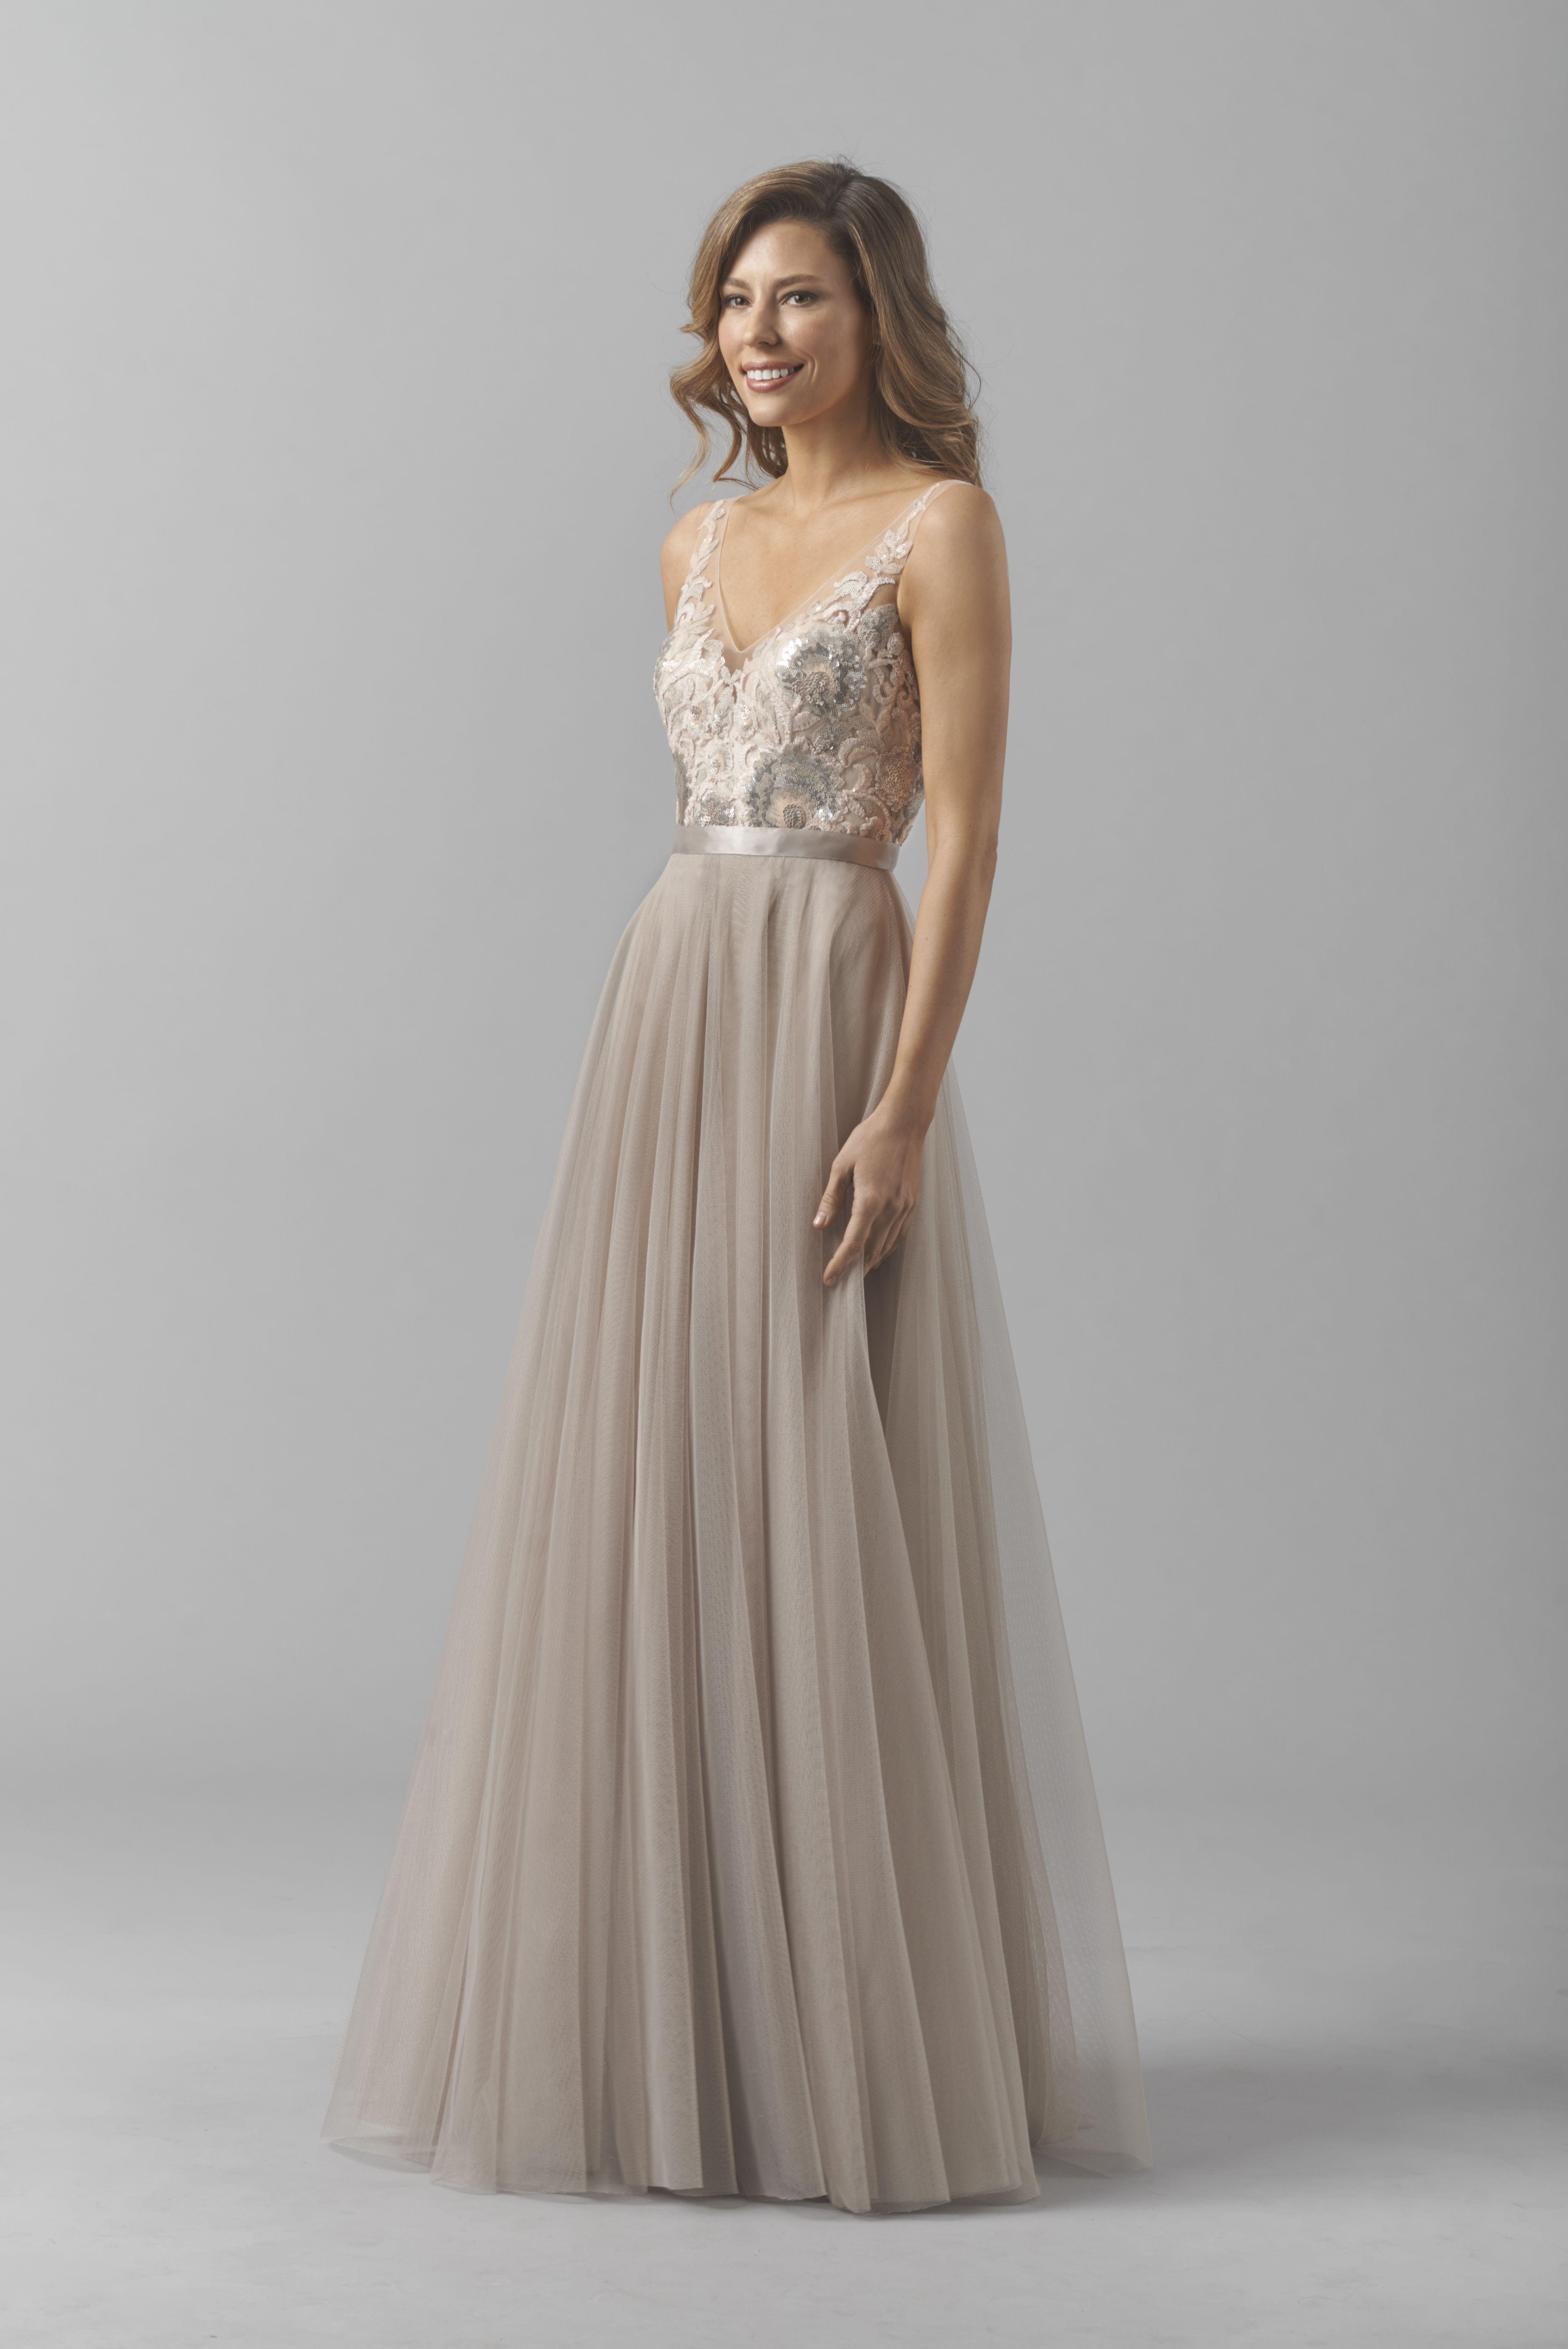 Watterswtoo bridesmaids dress 8355i the dress collection watterswtoo bridesmaids dress 8355i ombrellifo Gallery